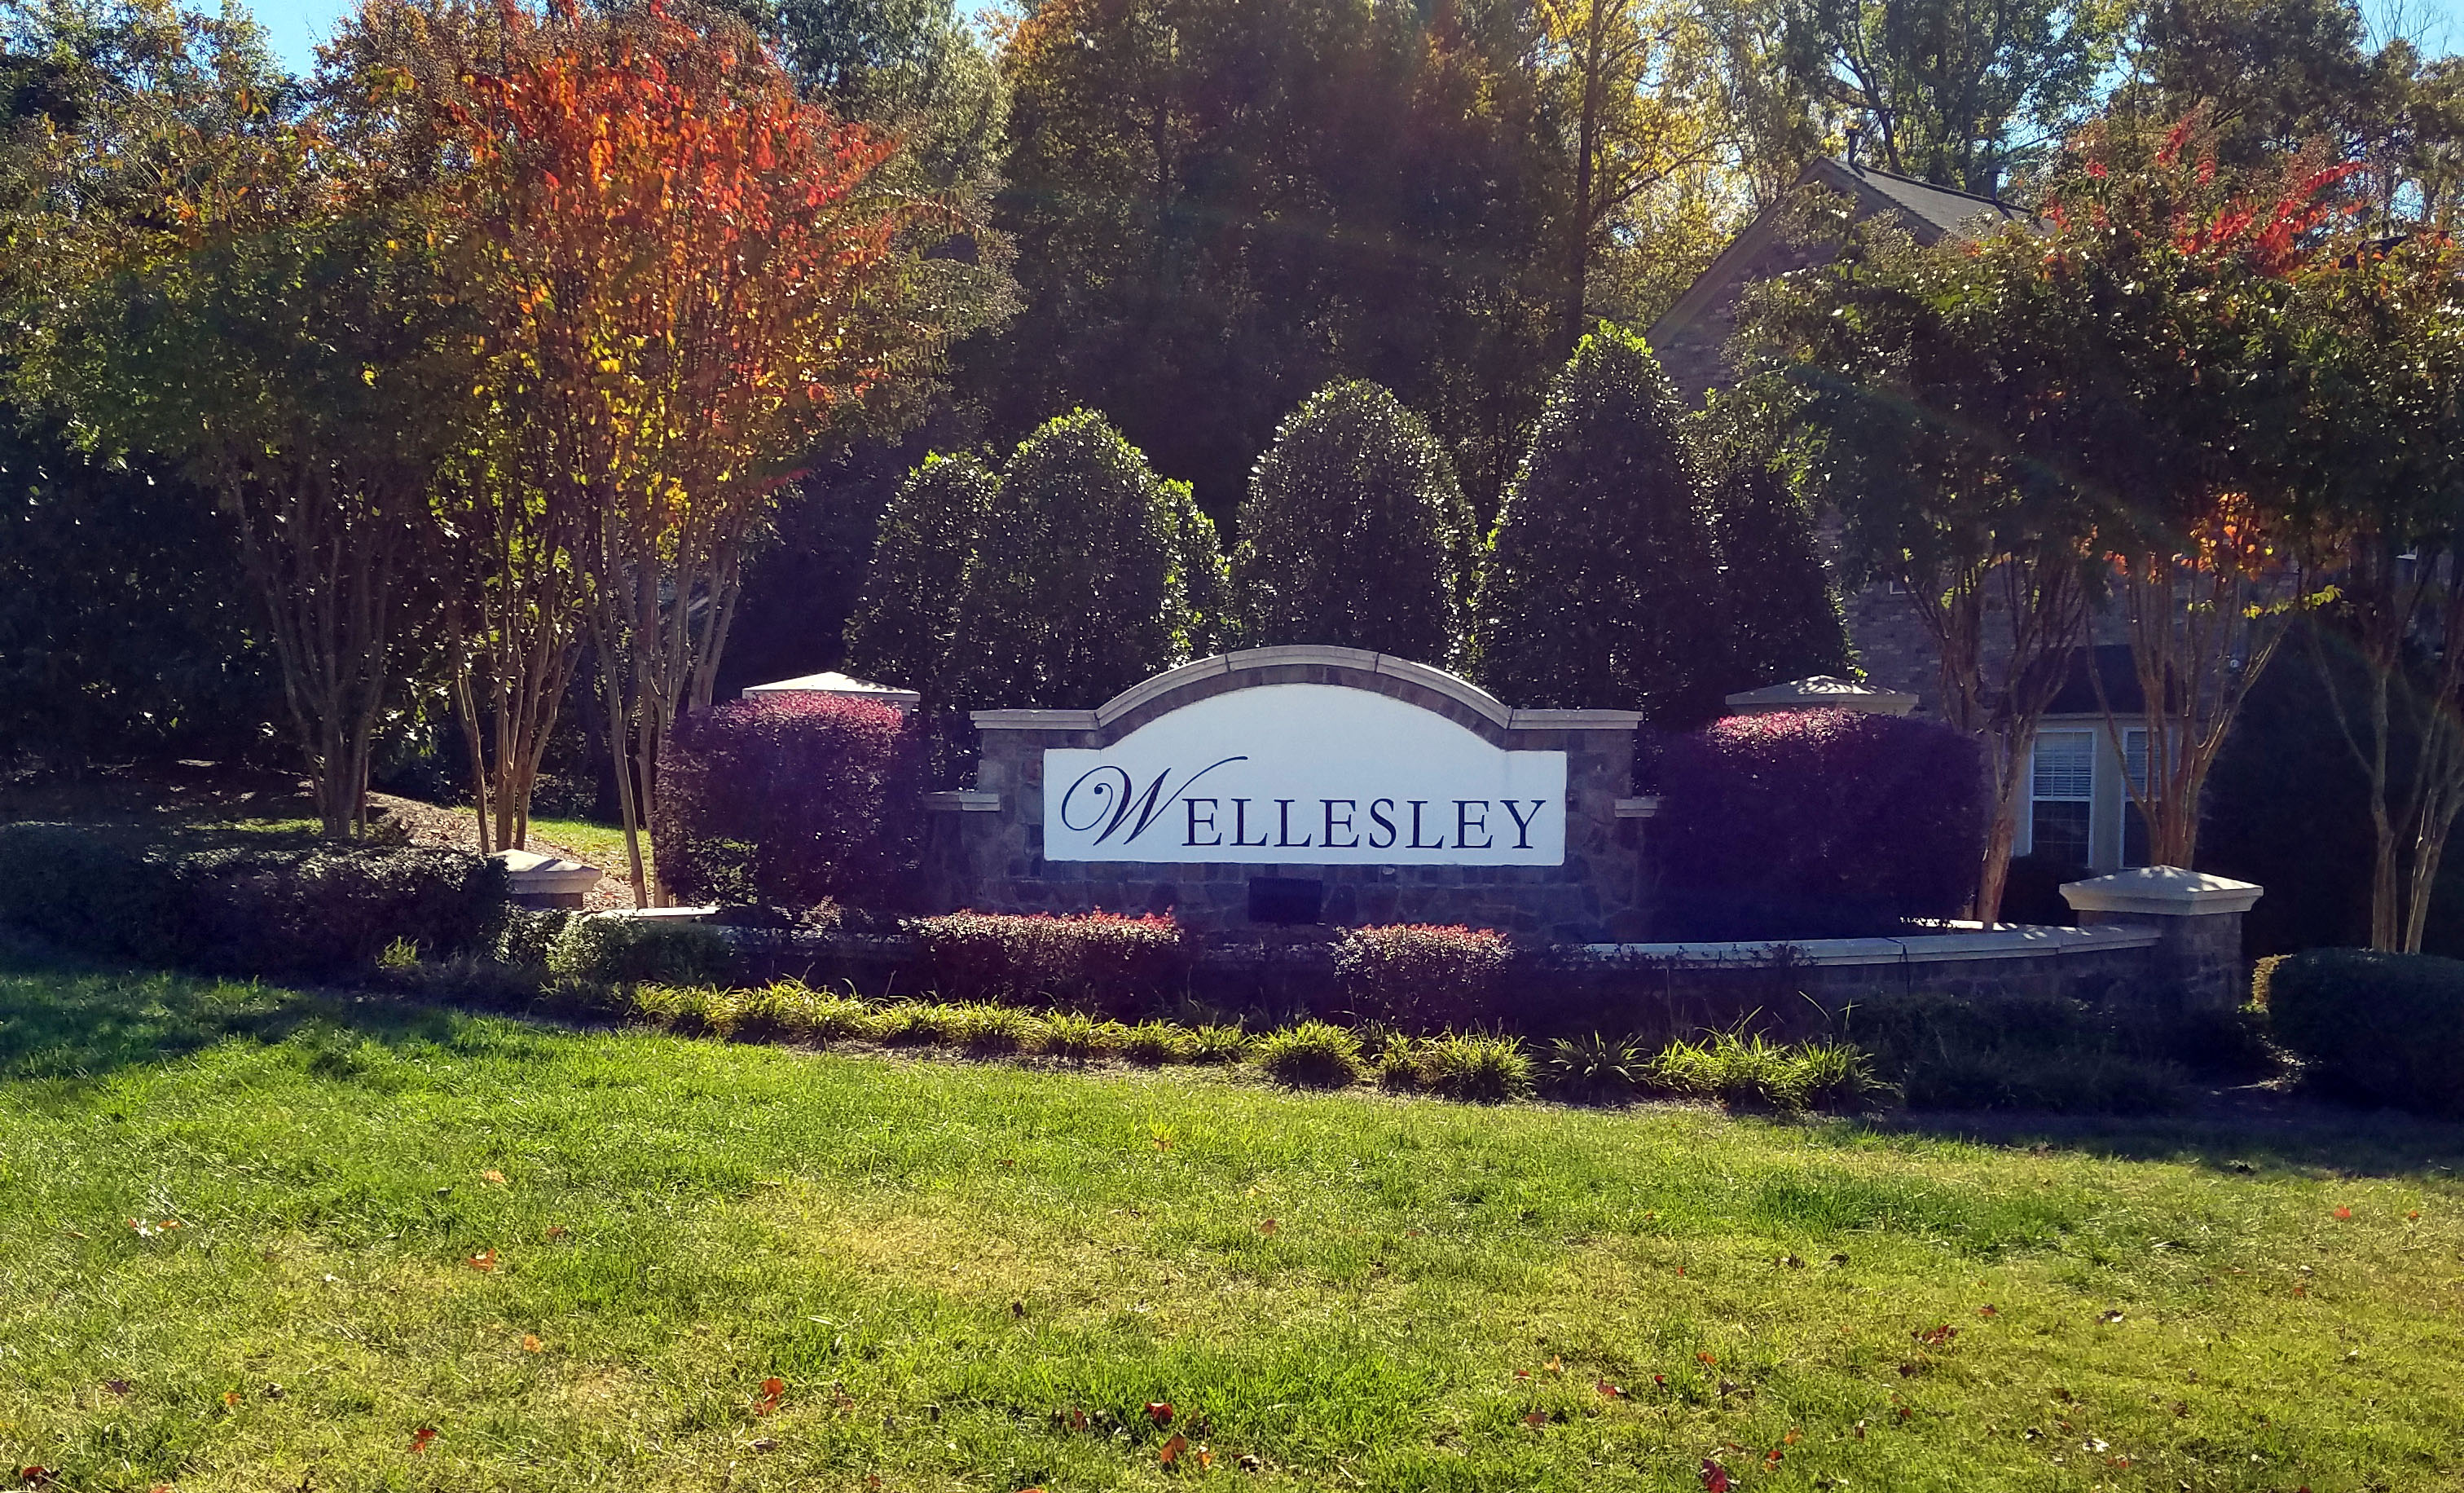 Wellesley Entrance Monument